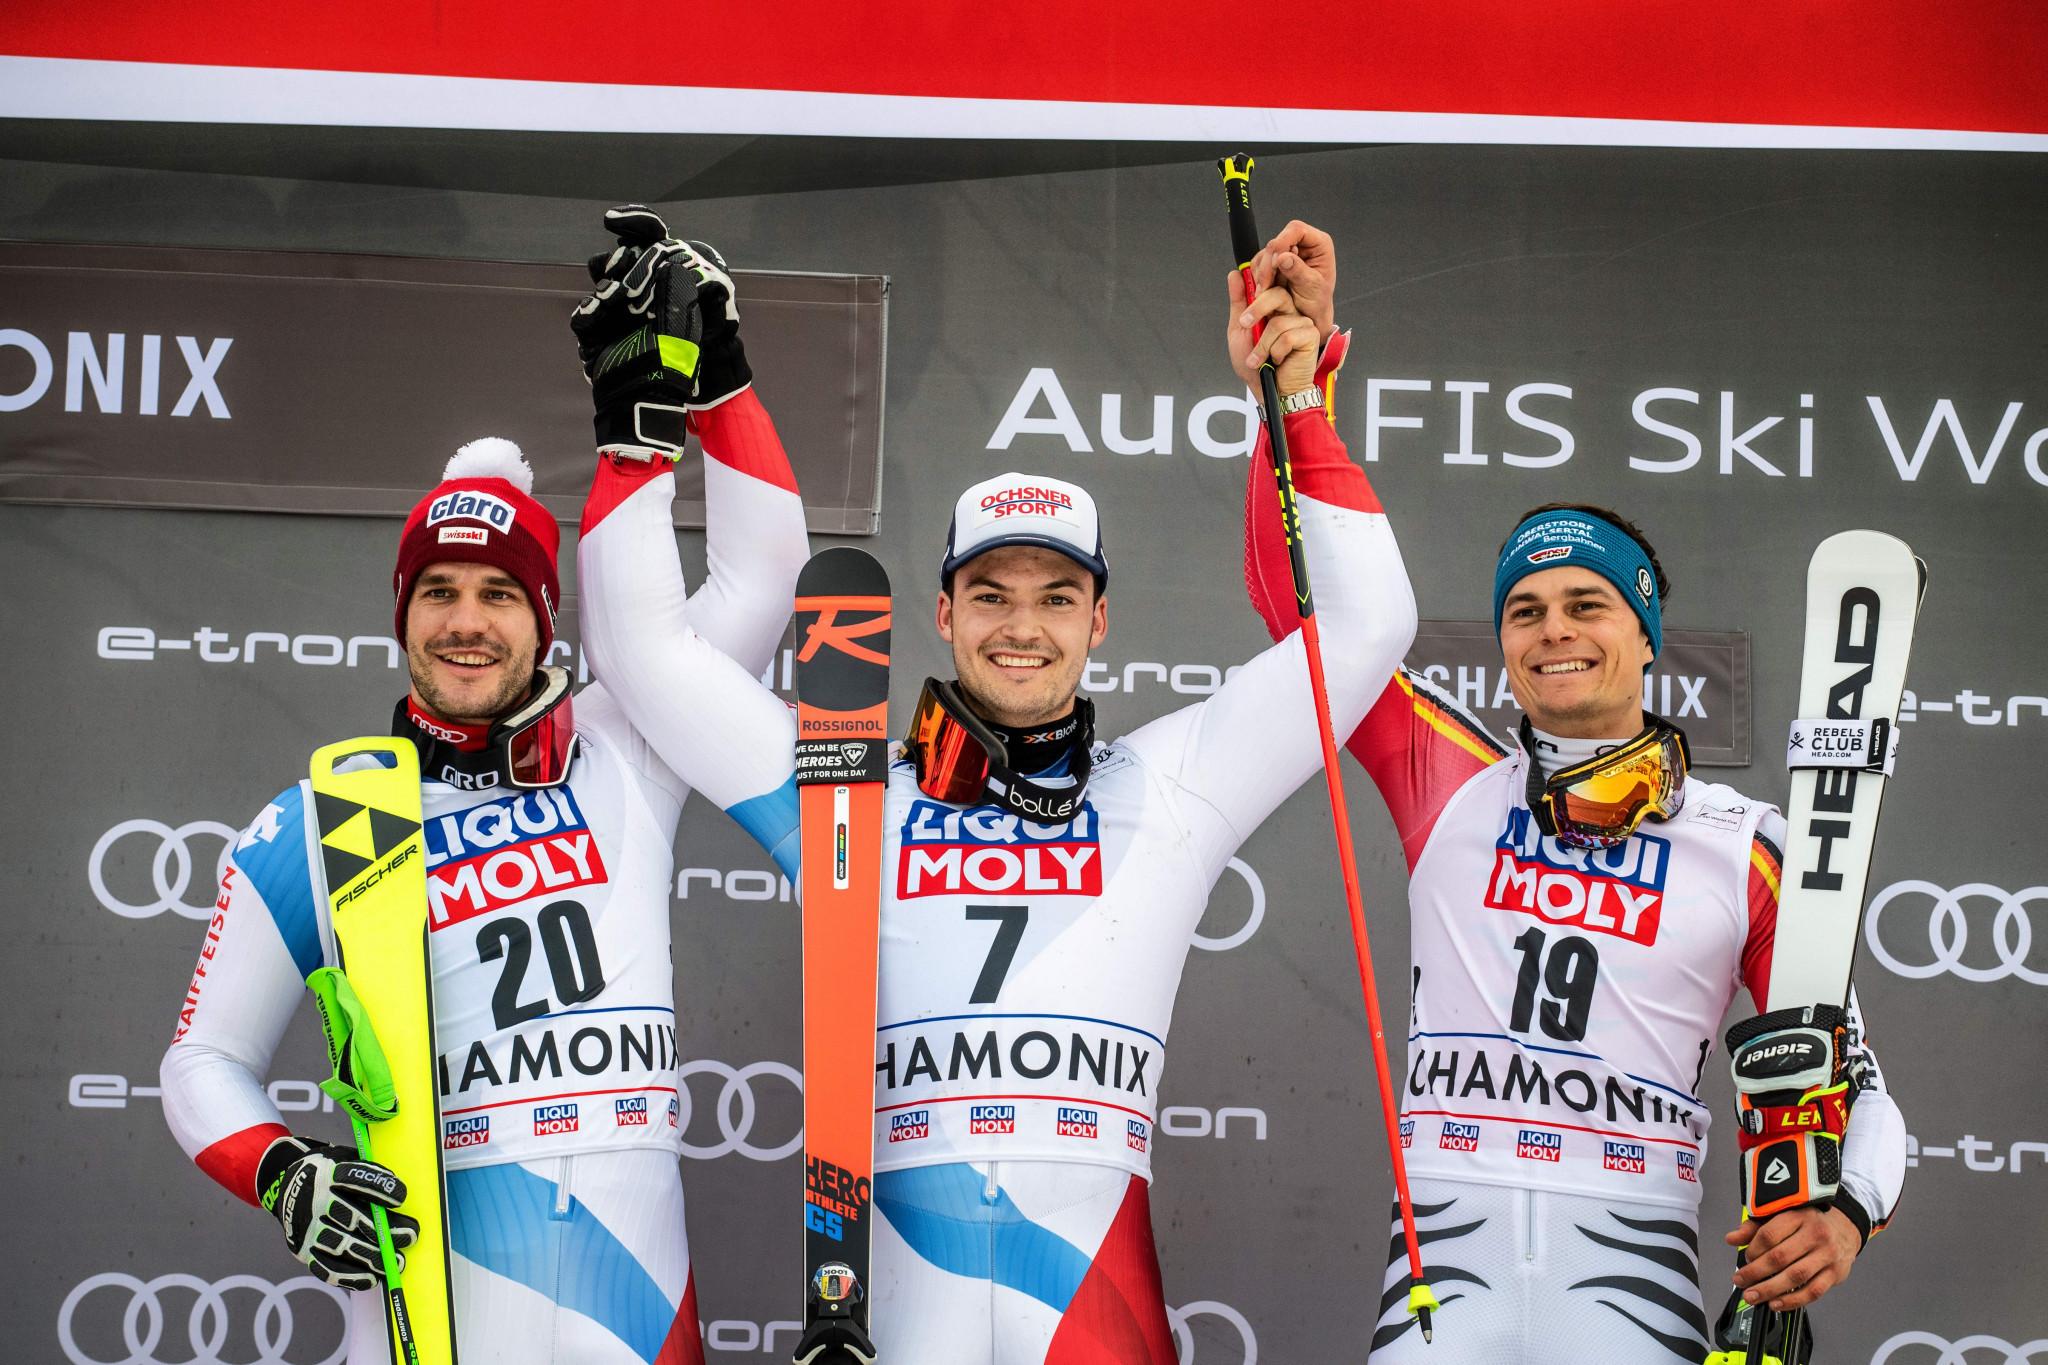 Meillard wins first FIS Alpine Ski World Cup event in Chamonix